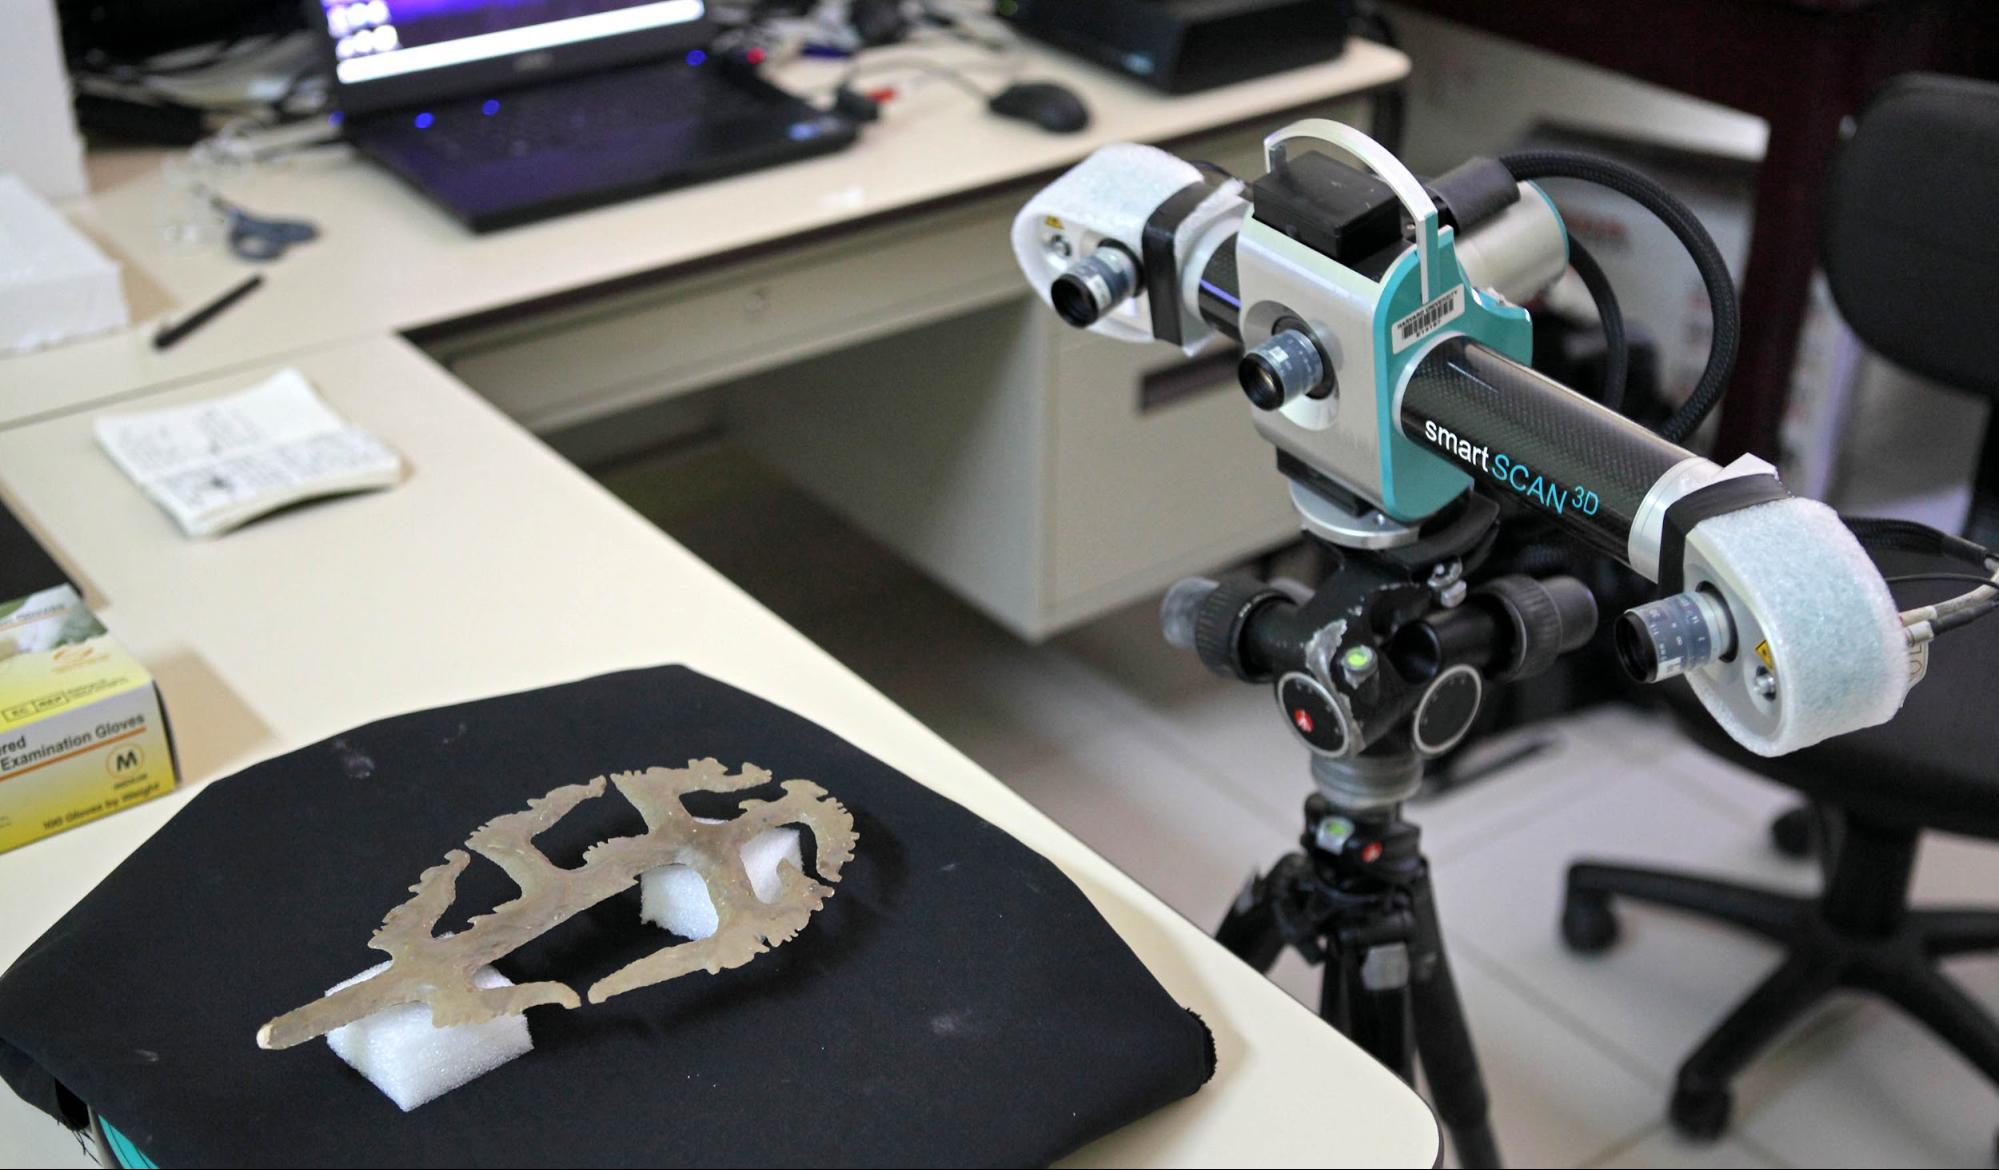 copan maya artifact 3d scan